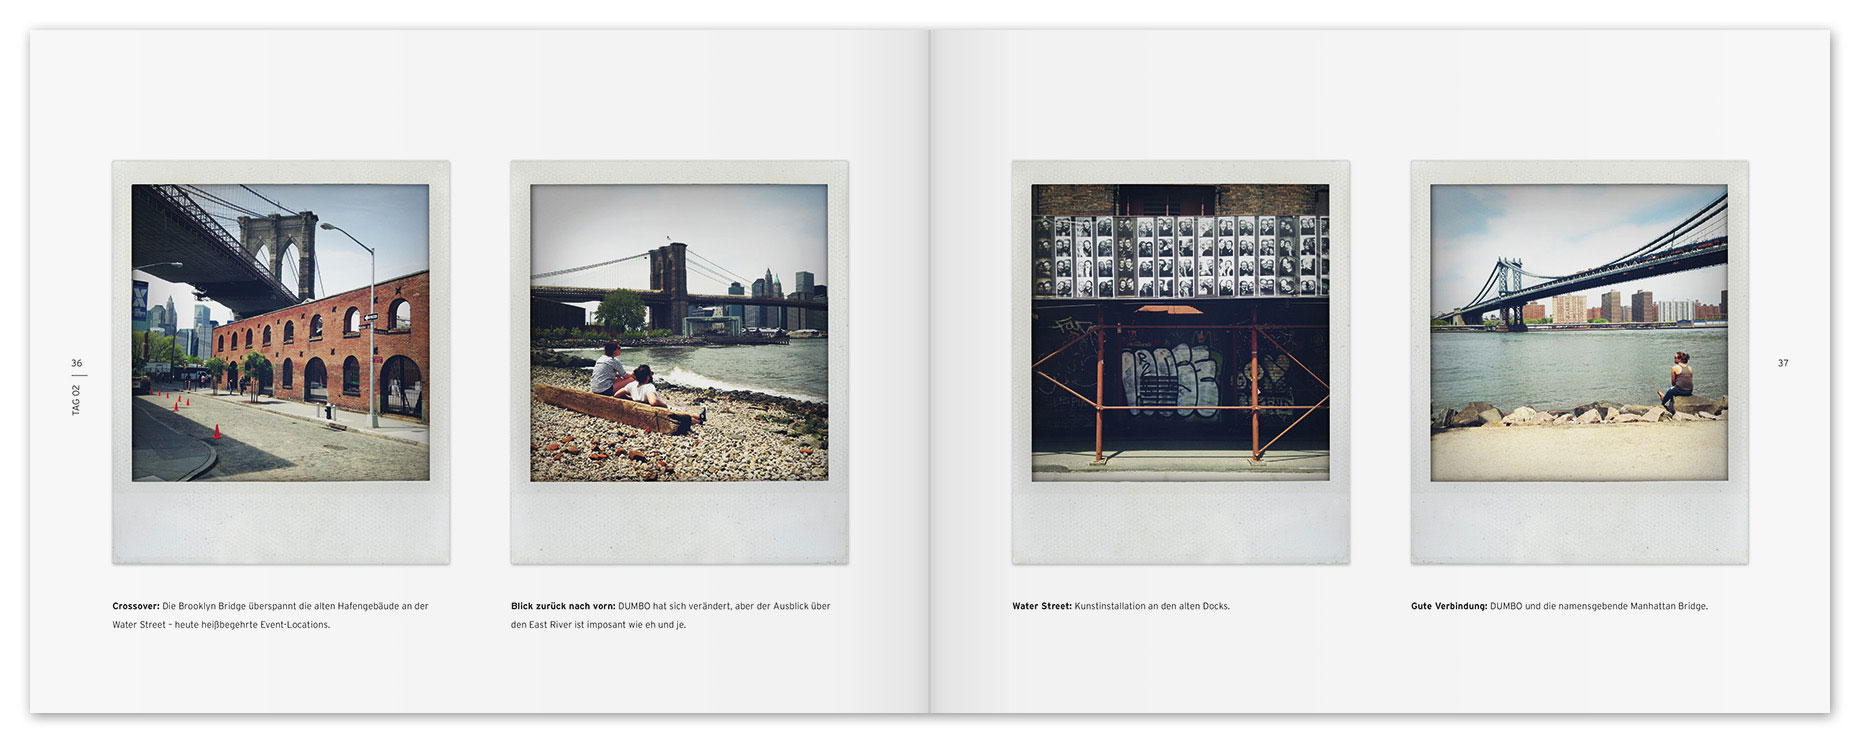 Manhattan-Diary-Leseprobe-Tag2-Edition-Wagner1972.jpg